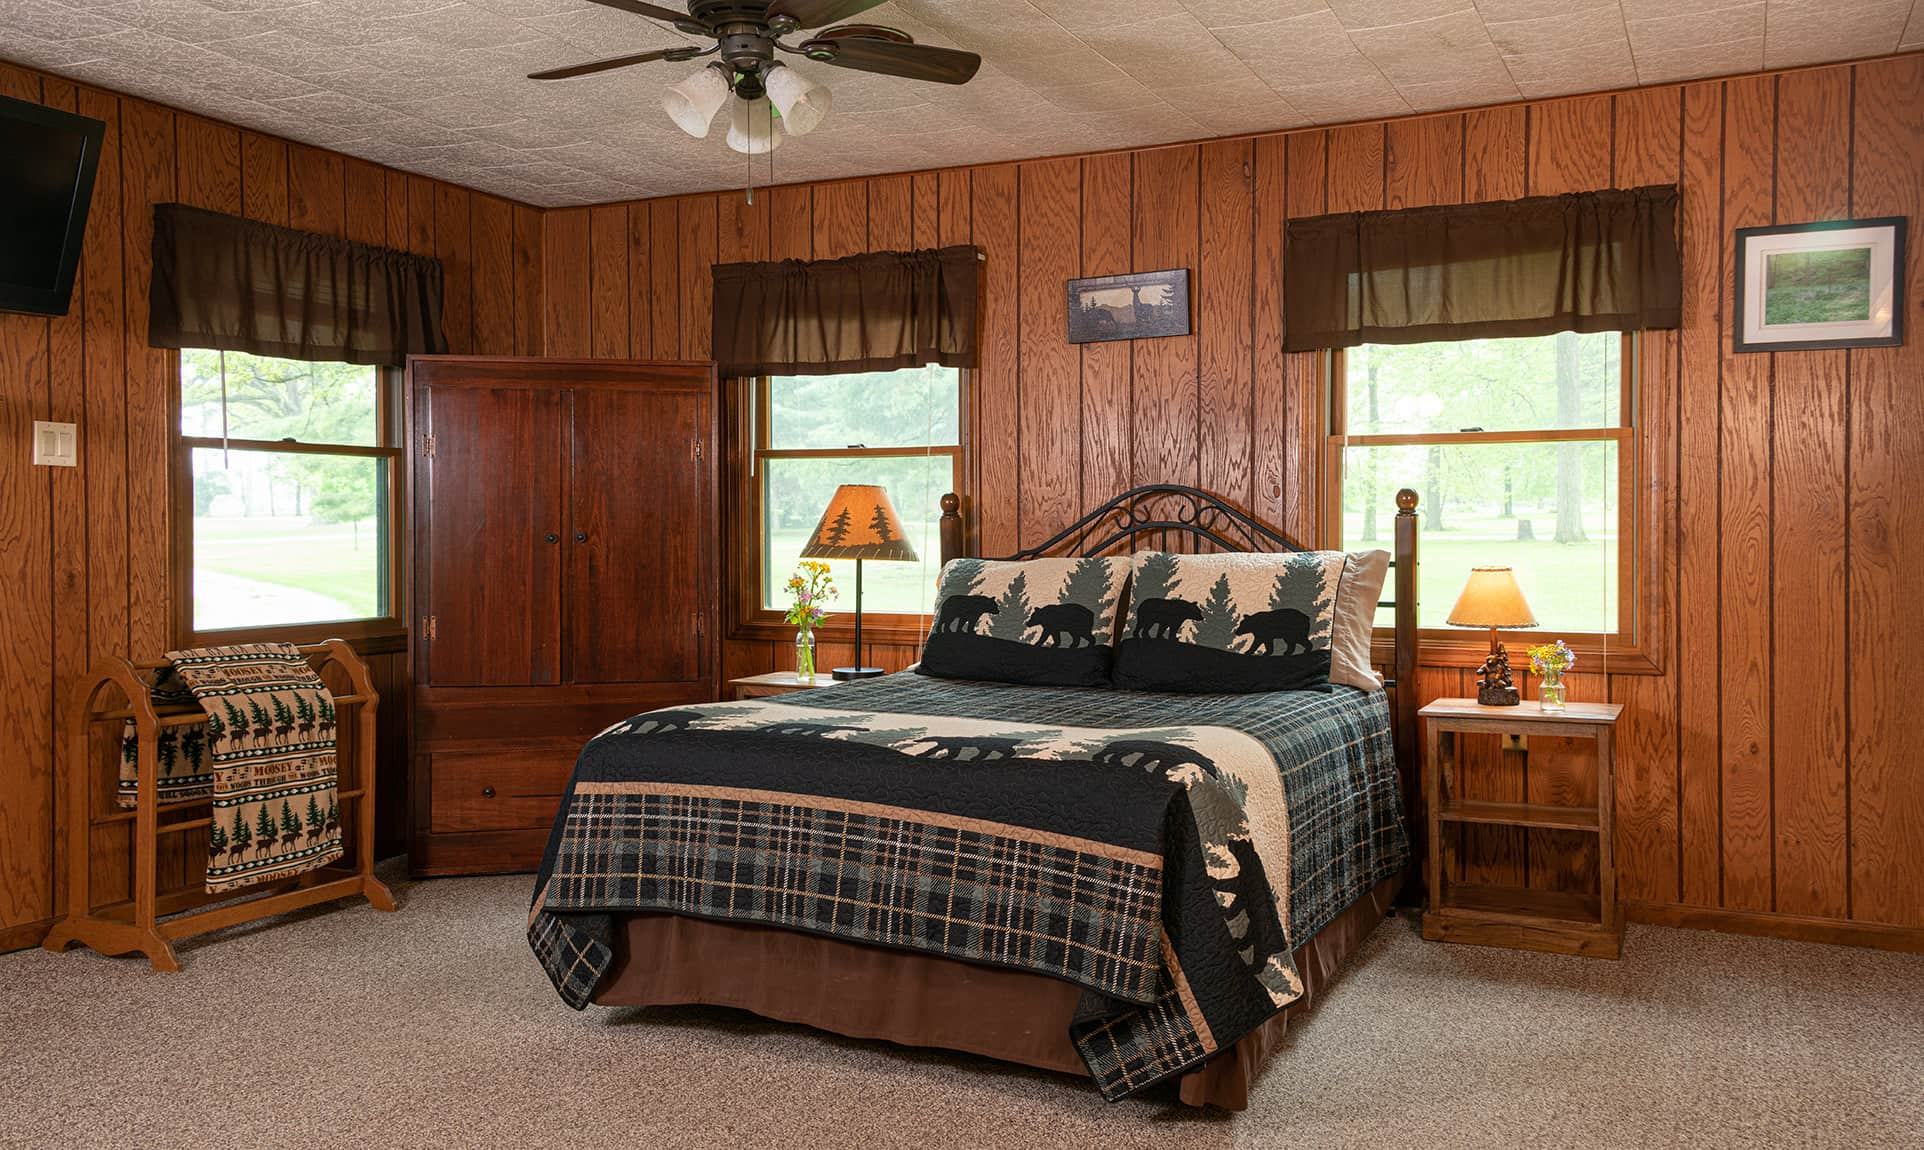 Bridge Cabin bed - romantic accommodations near Starved Rock